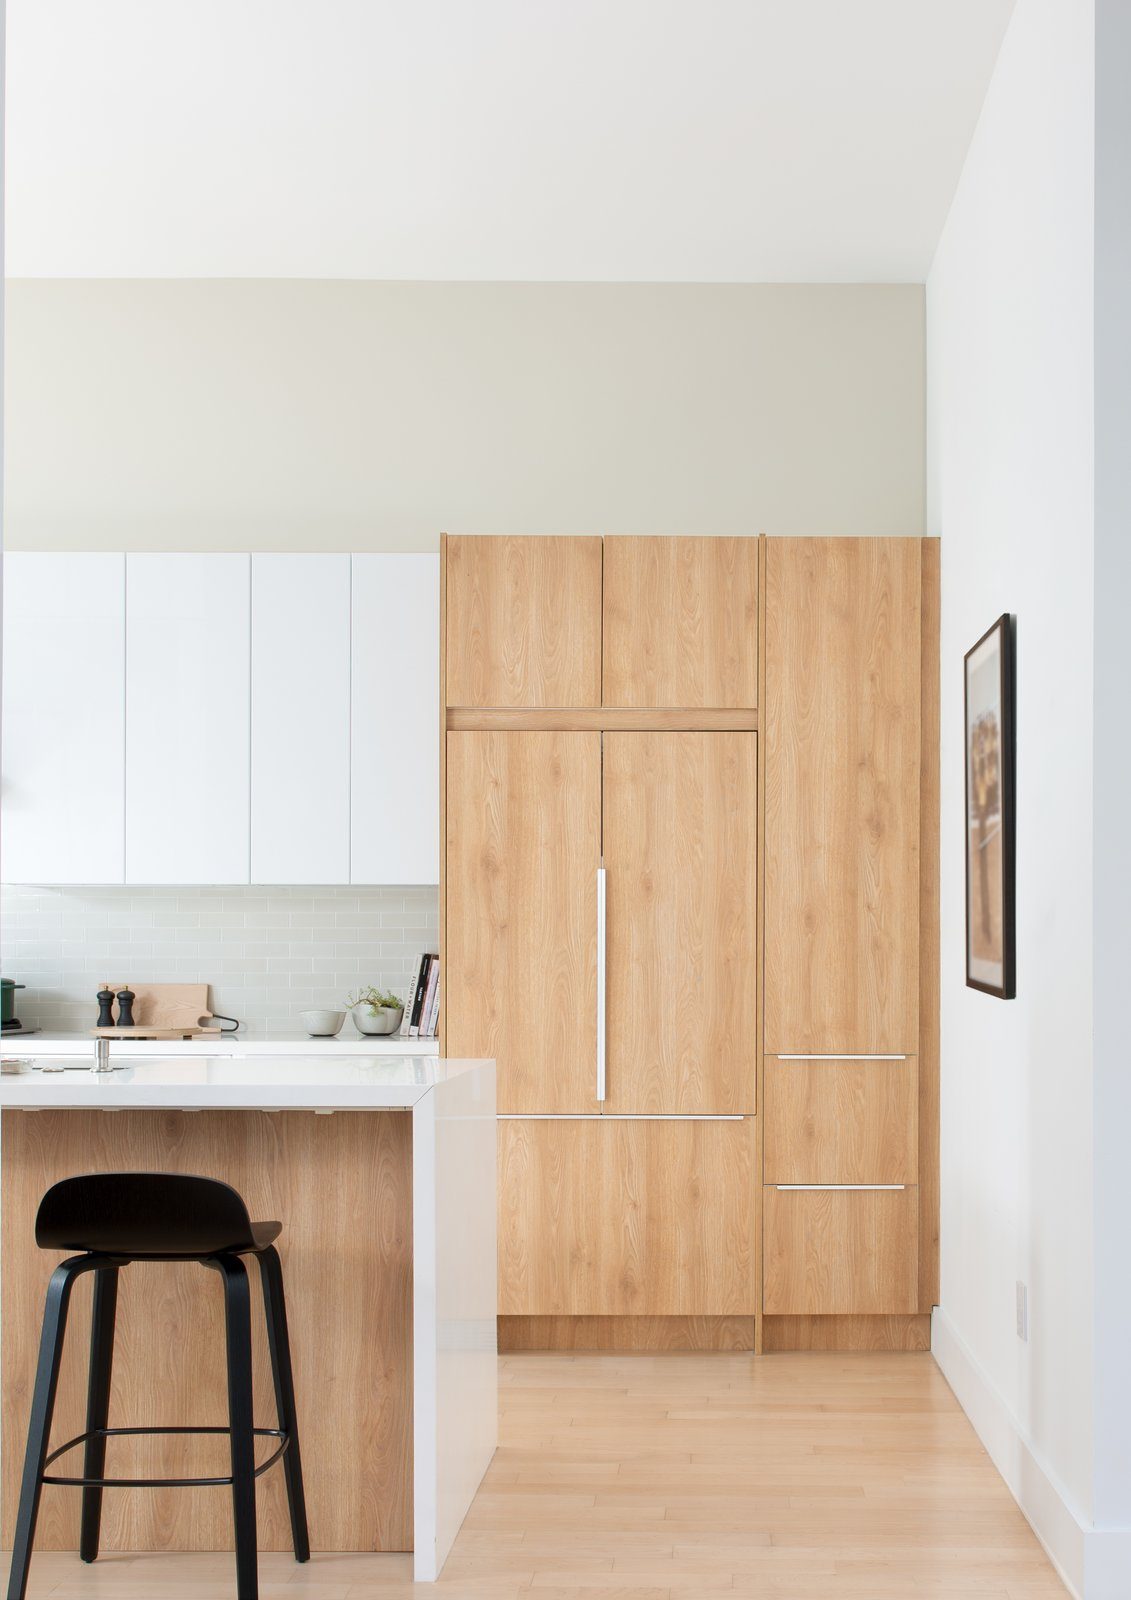 Kitchen, Ceiling Lighting, White Cabinet, Laminate Cabinet, Refrigerator, Subway Tile Backsplashe, Light Hardwood Floor, and Wood Cabinet Kitchen  Moody Mission Victorian by Regan Baker Design